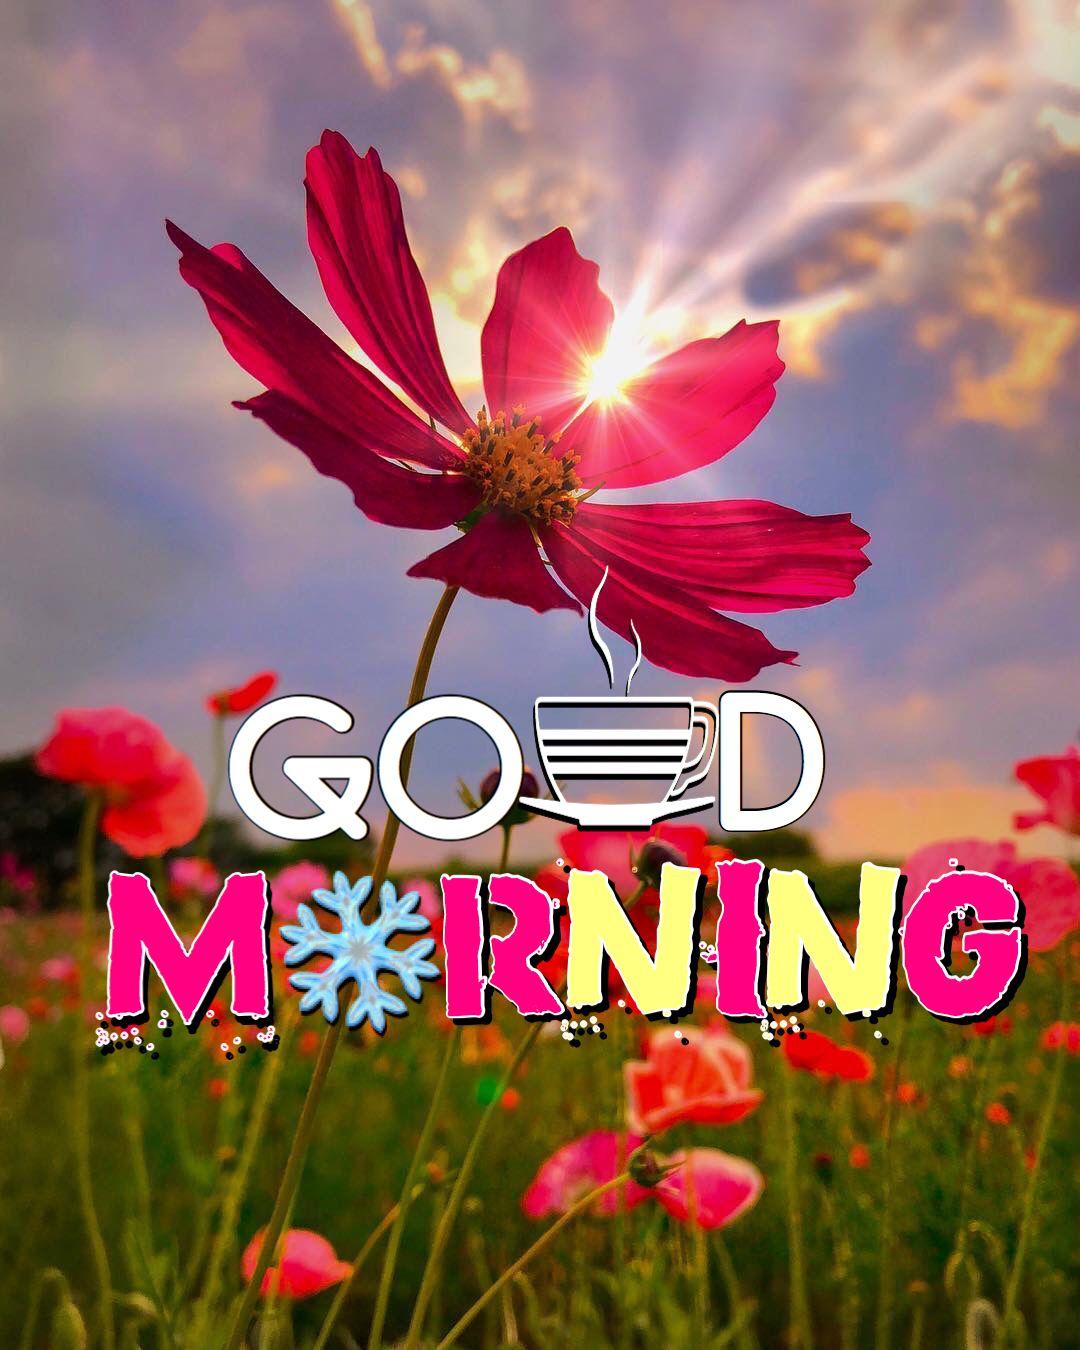 Good Morning Beautiful In Spanish Images - MORNING WALLS